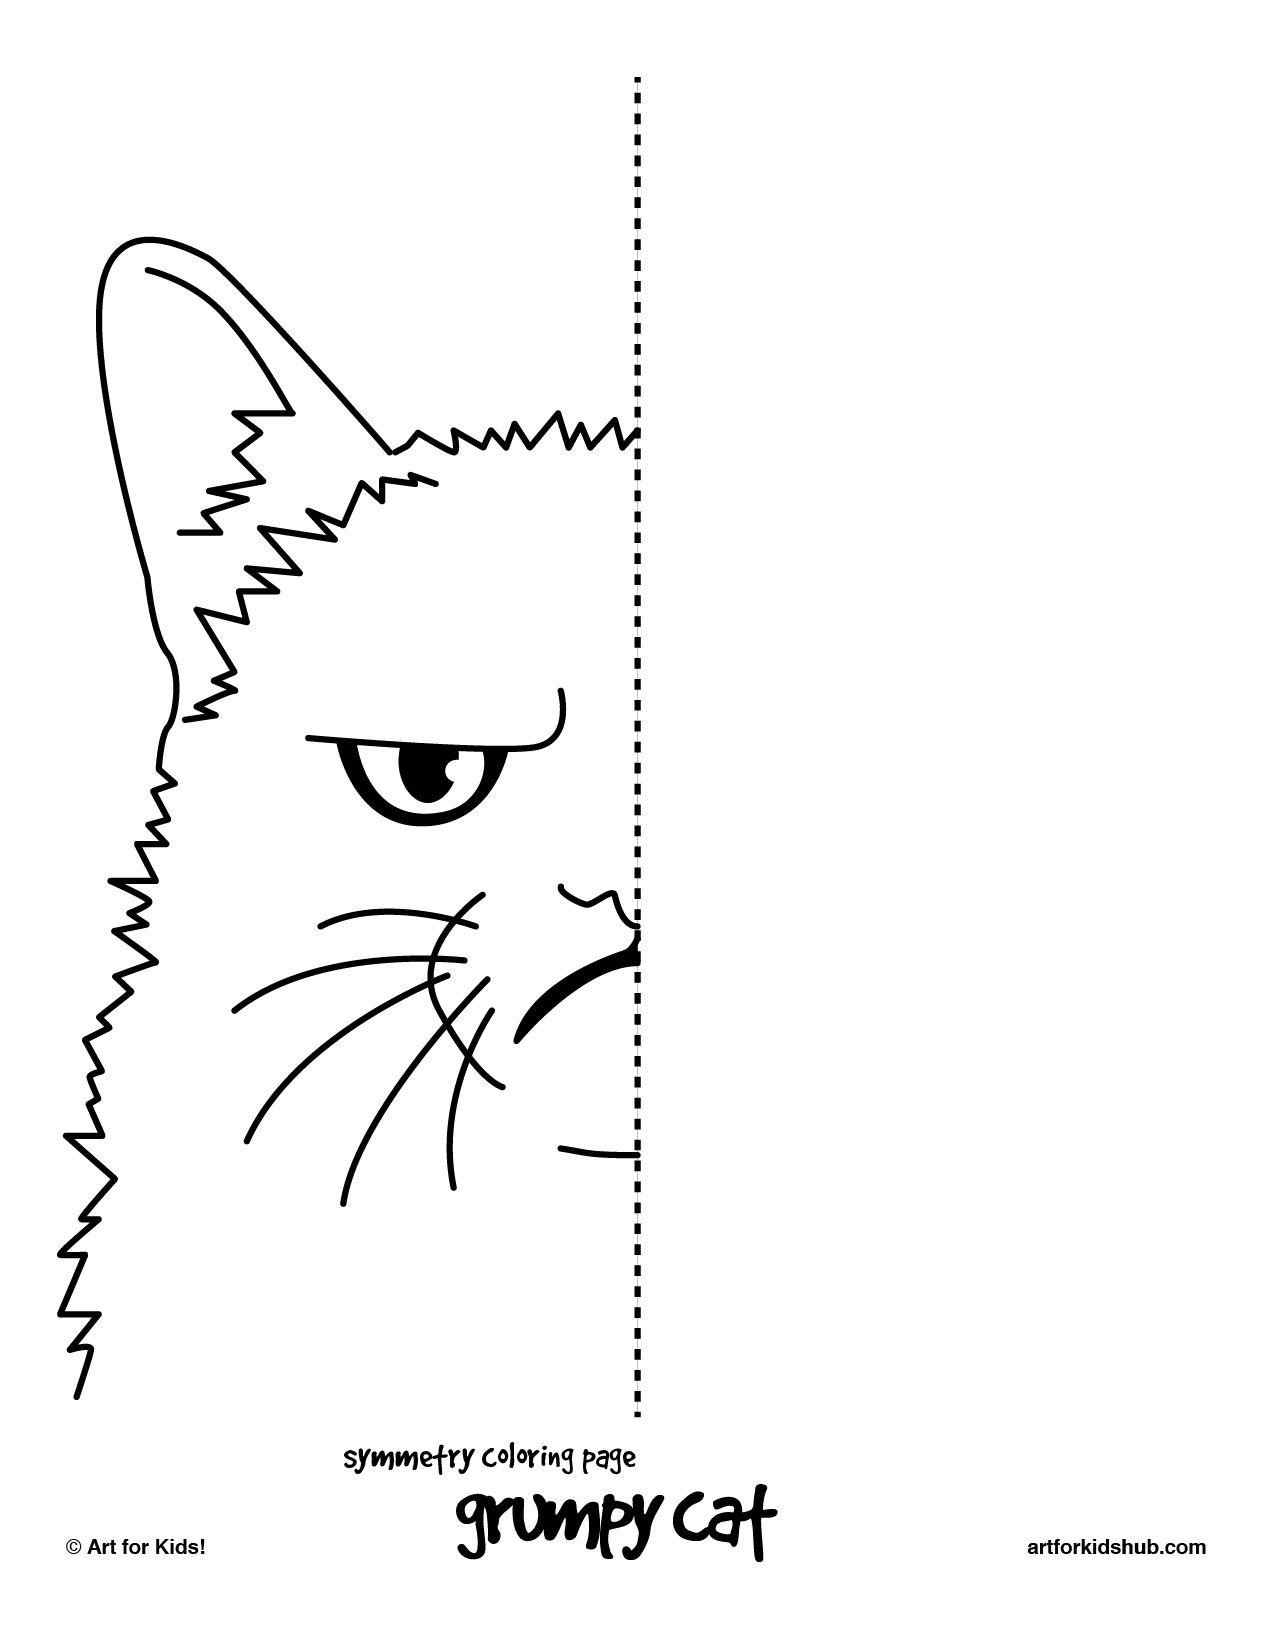 Grumpy Cat Symmetry